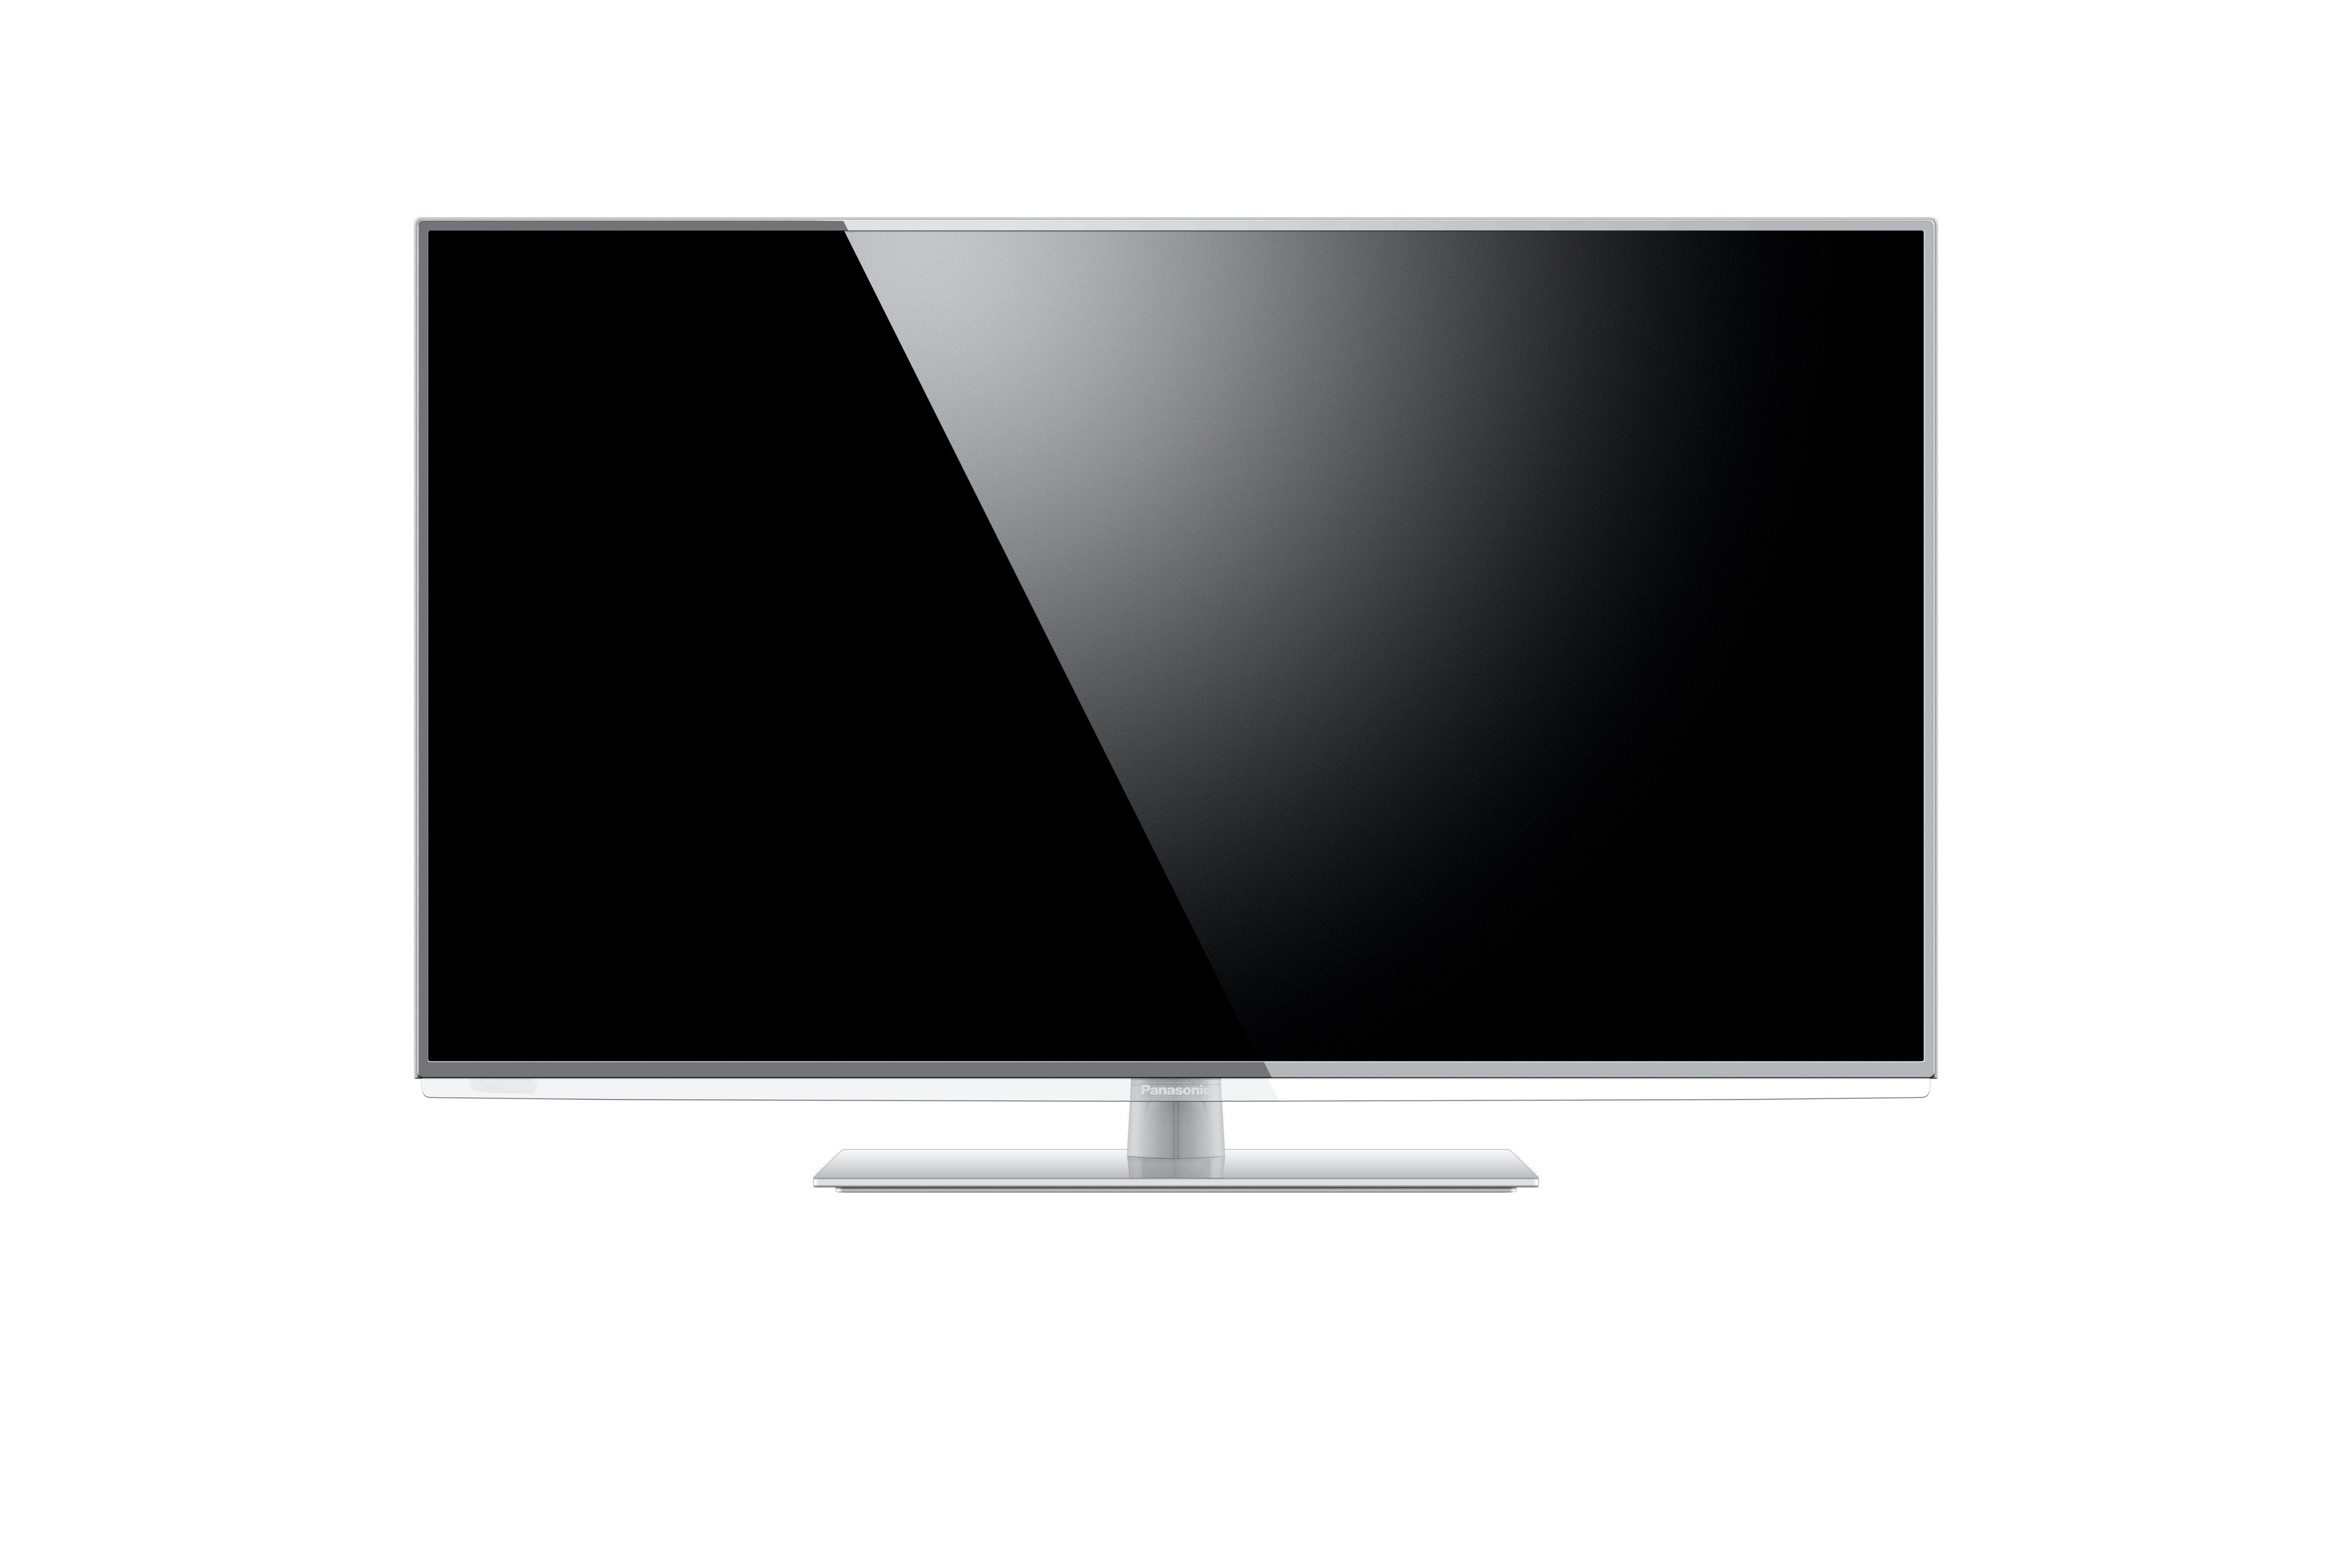 42 tv led panasonic smart txl42e6e comprar. Black Bedroom Furniture Sets. Home Design Ideas